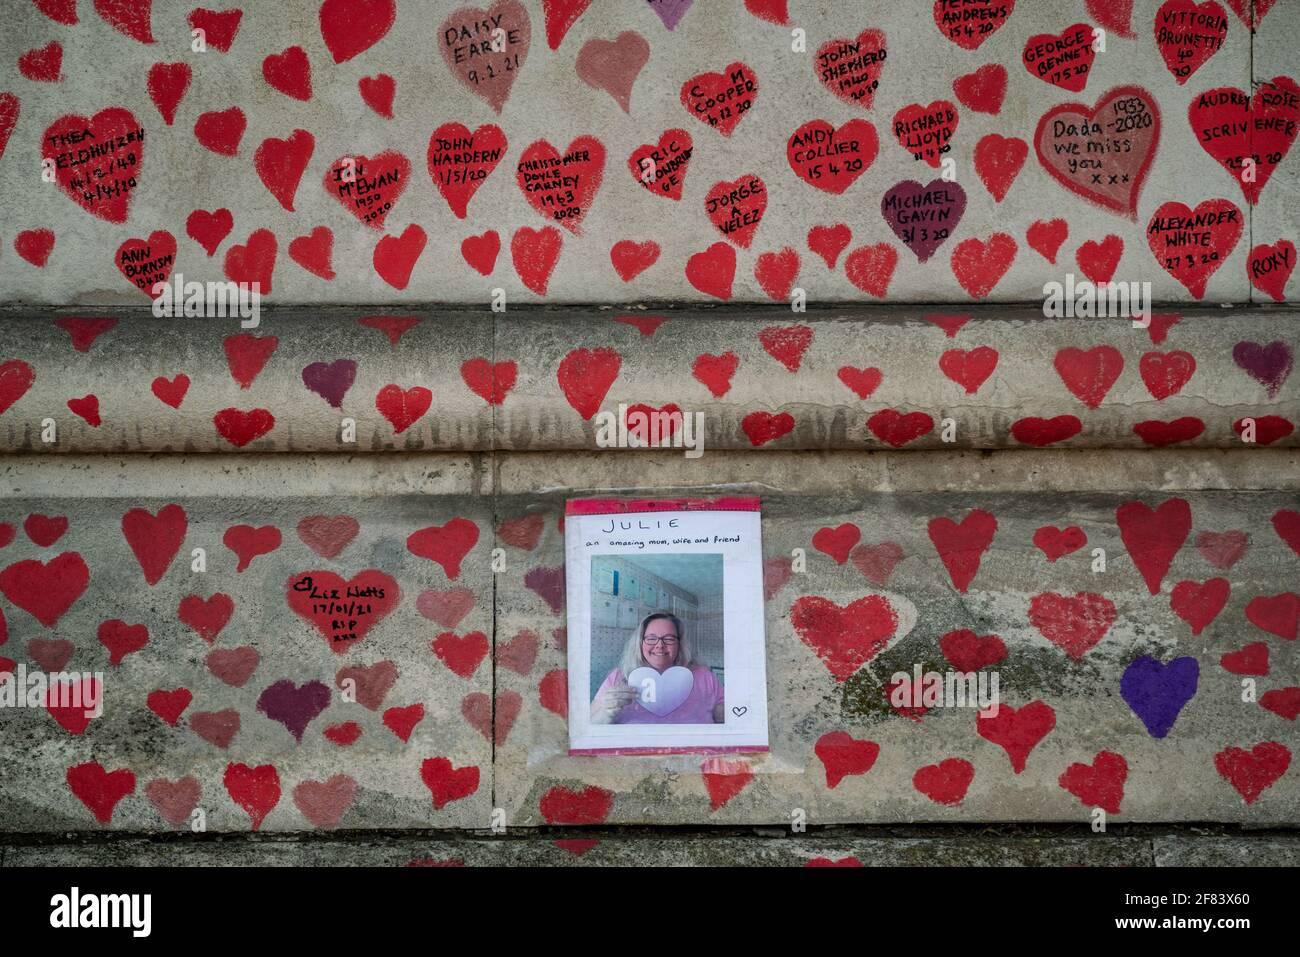 Coronavirus: National Covid Memorial Wall of Hearts, Westminster, Londres, Reino Unido. Foto de stock